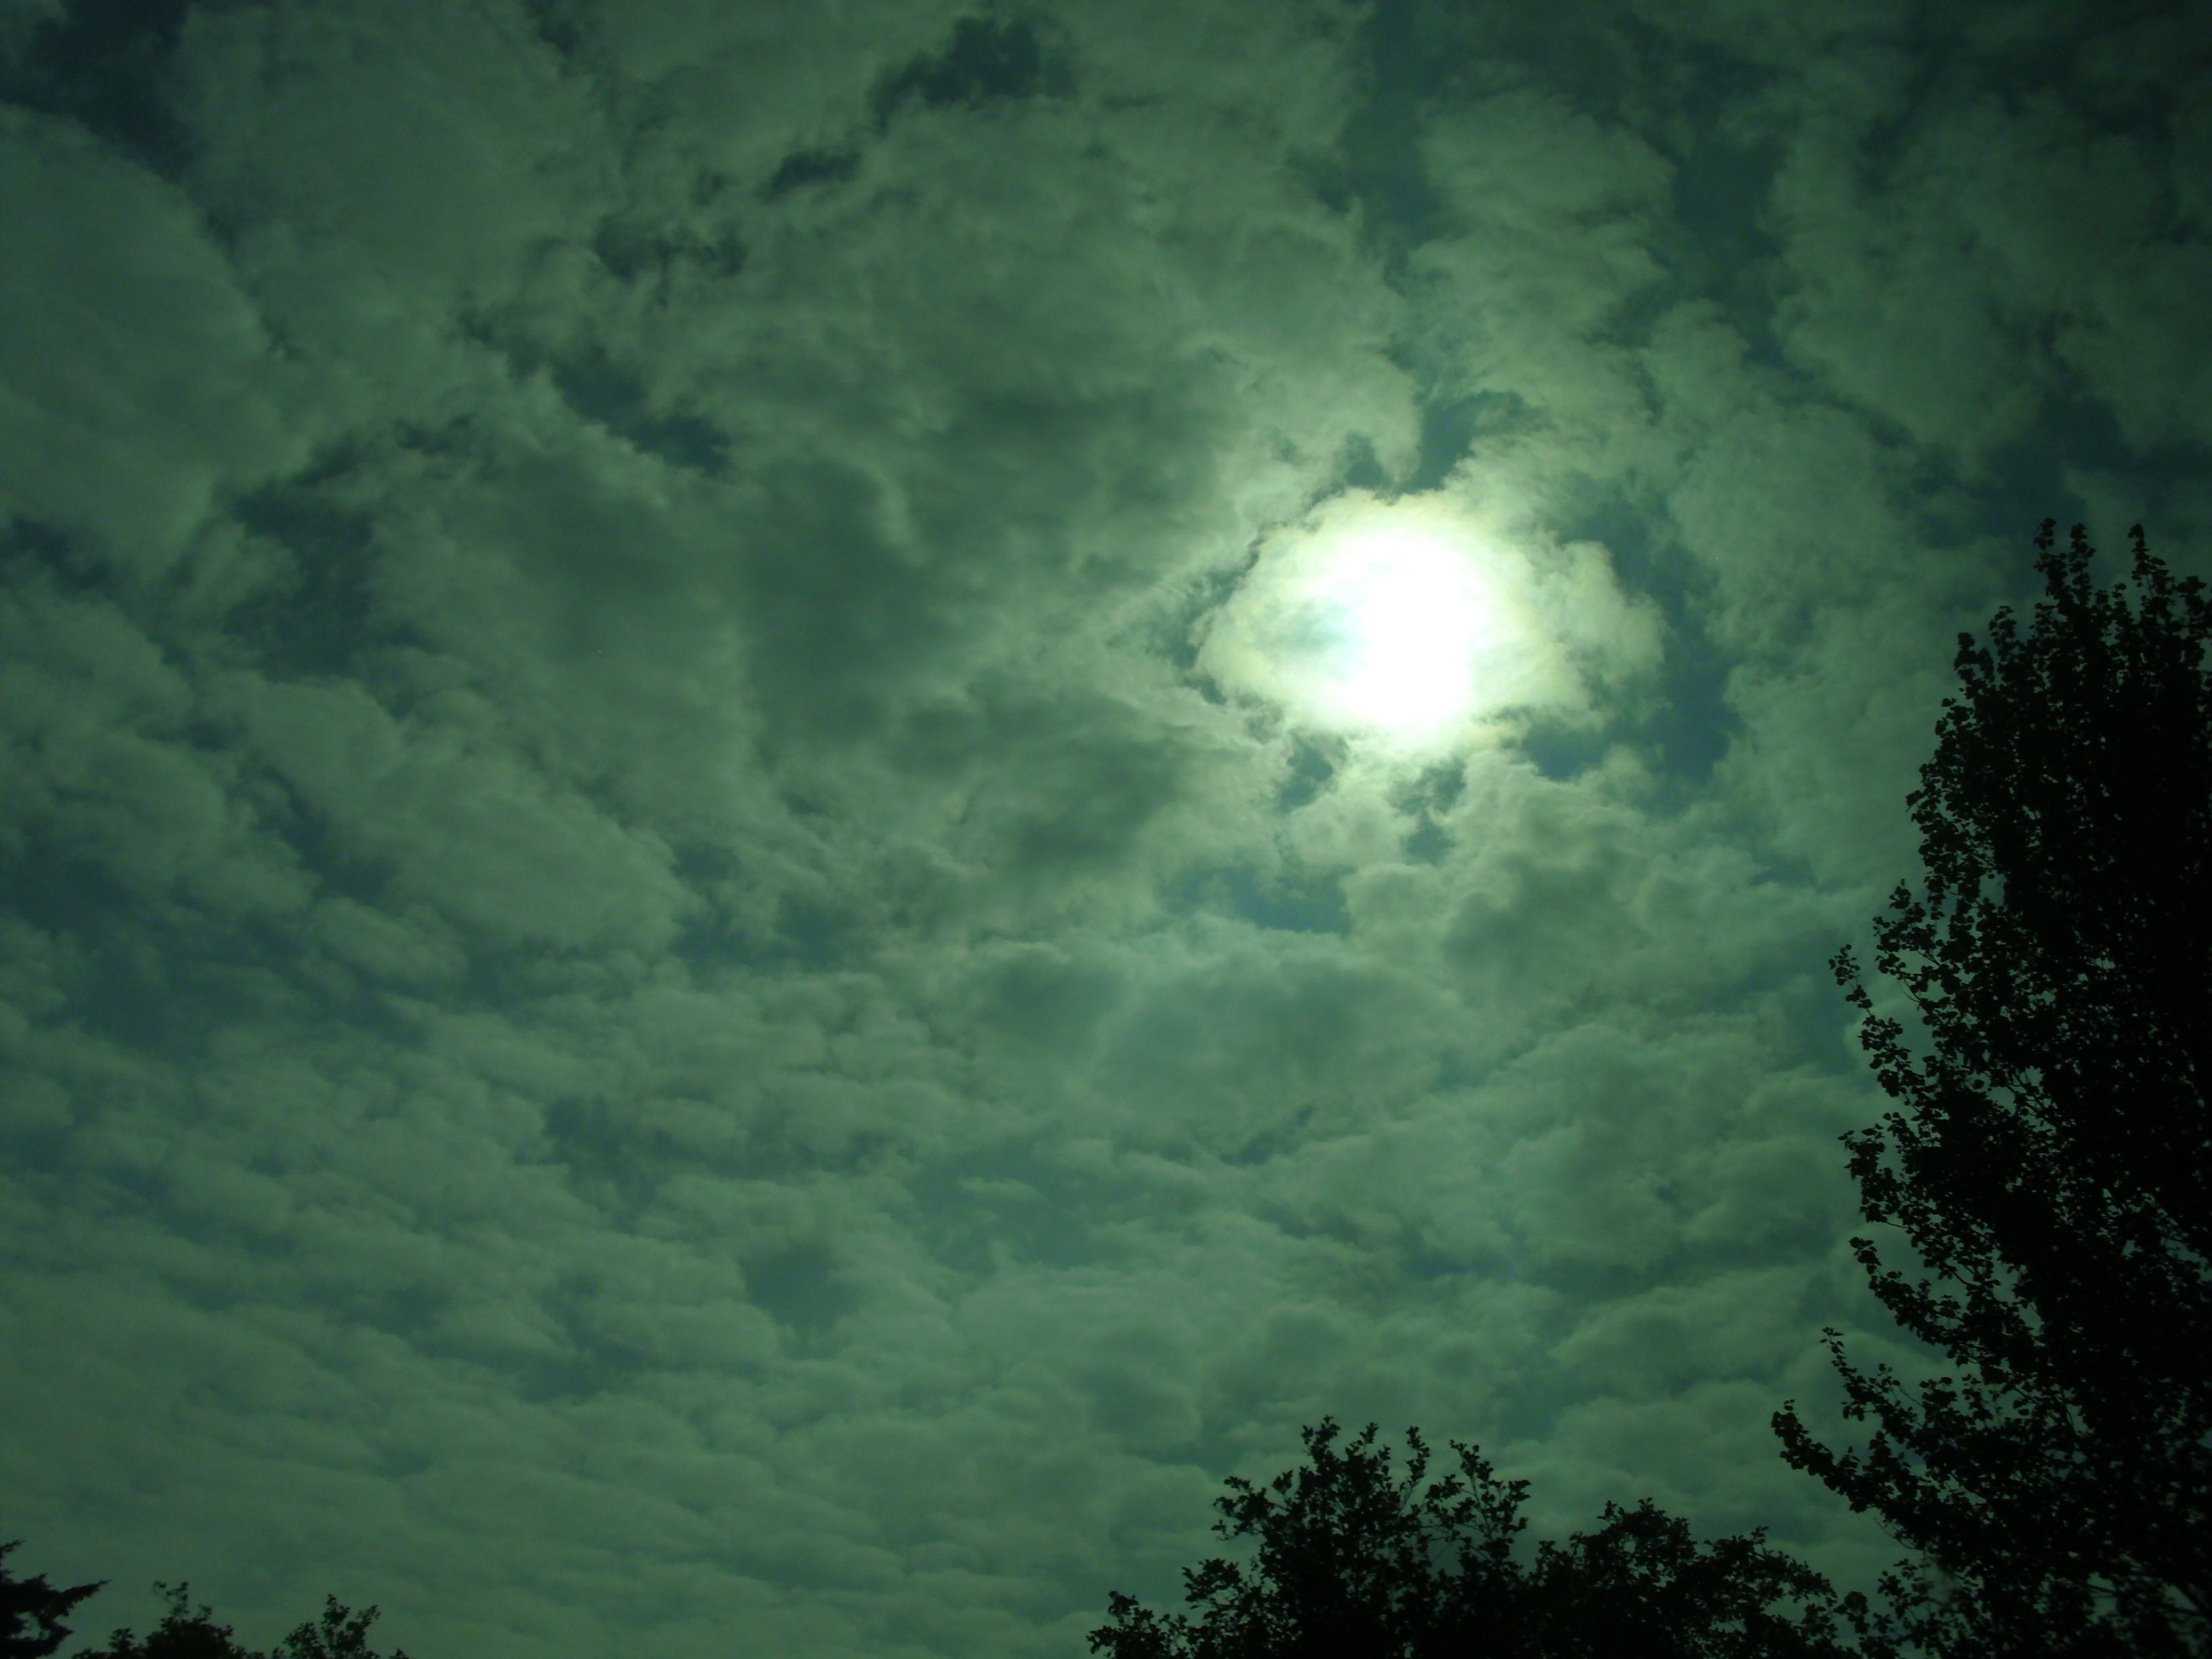 Himmel 2 Sibyll Maschler